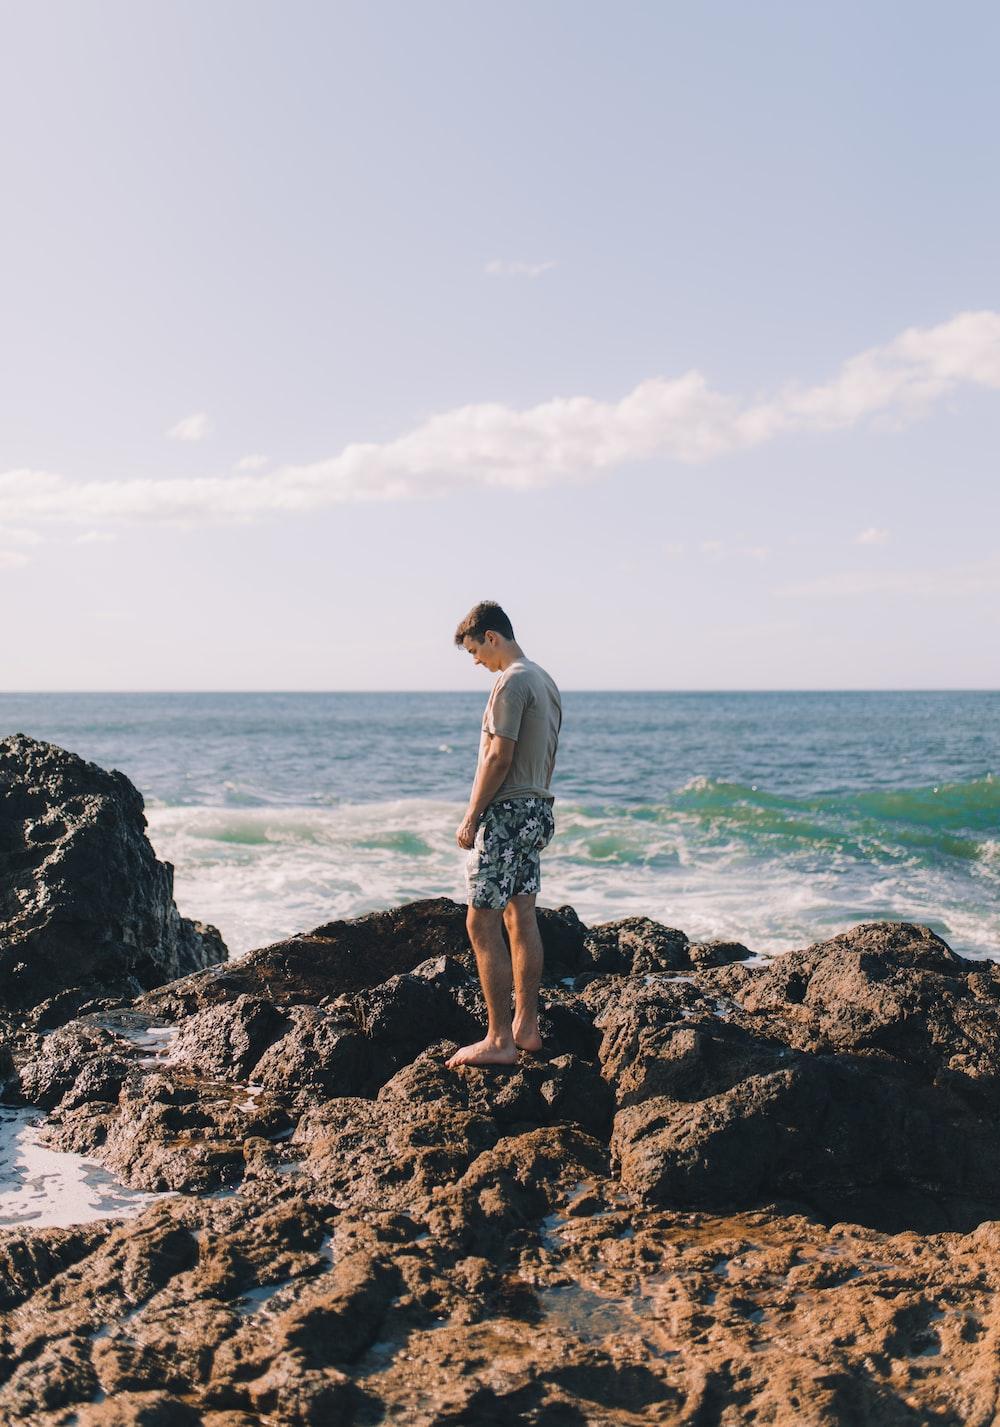 man standing on rock island beside beach